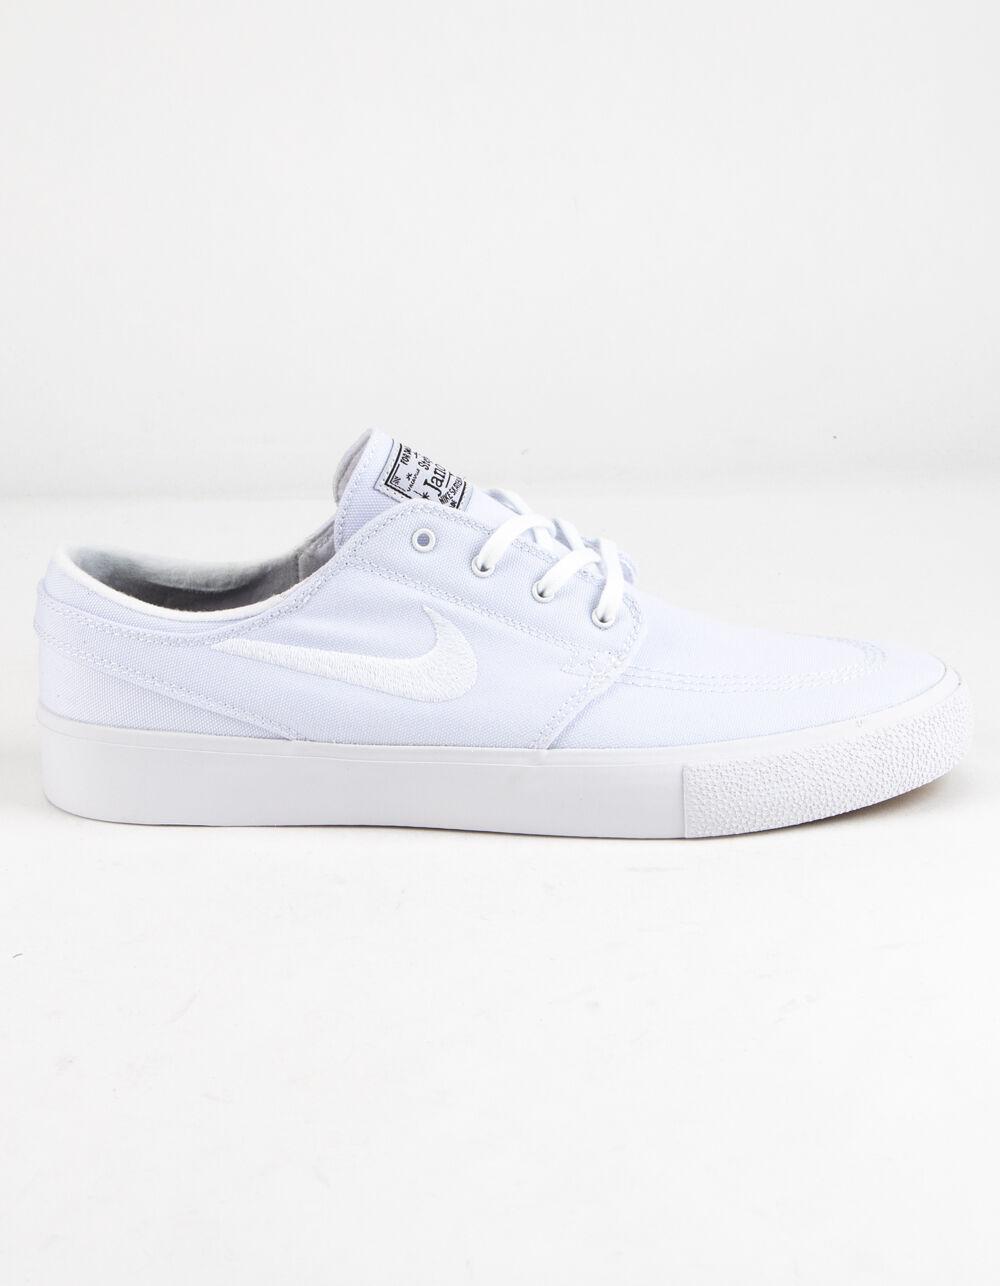 NIKE SB Zoom Janoski Canvas RM White Shoes